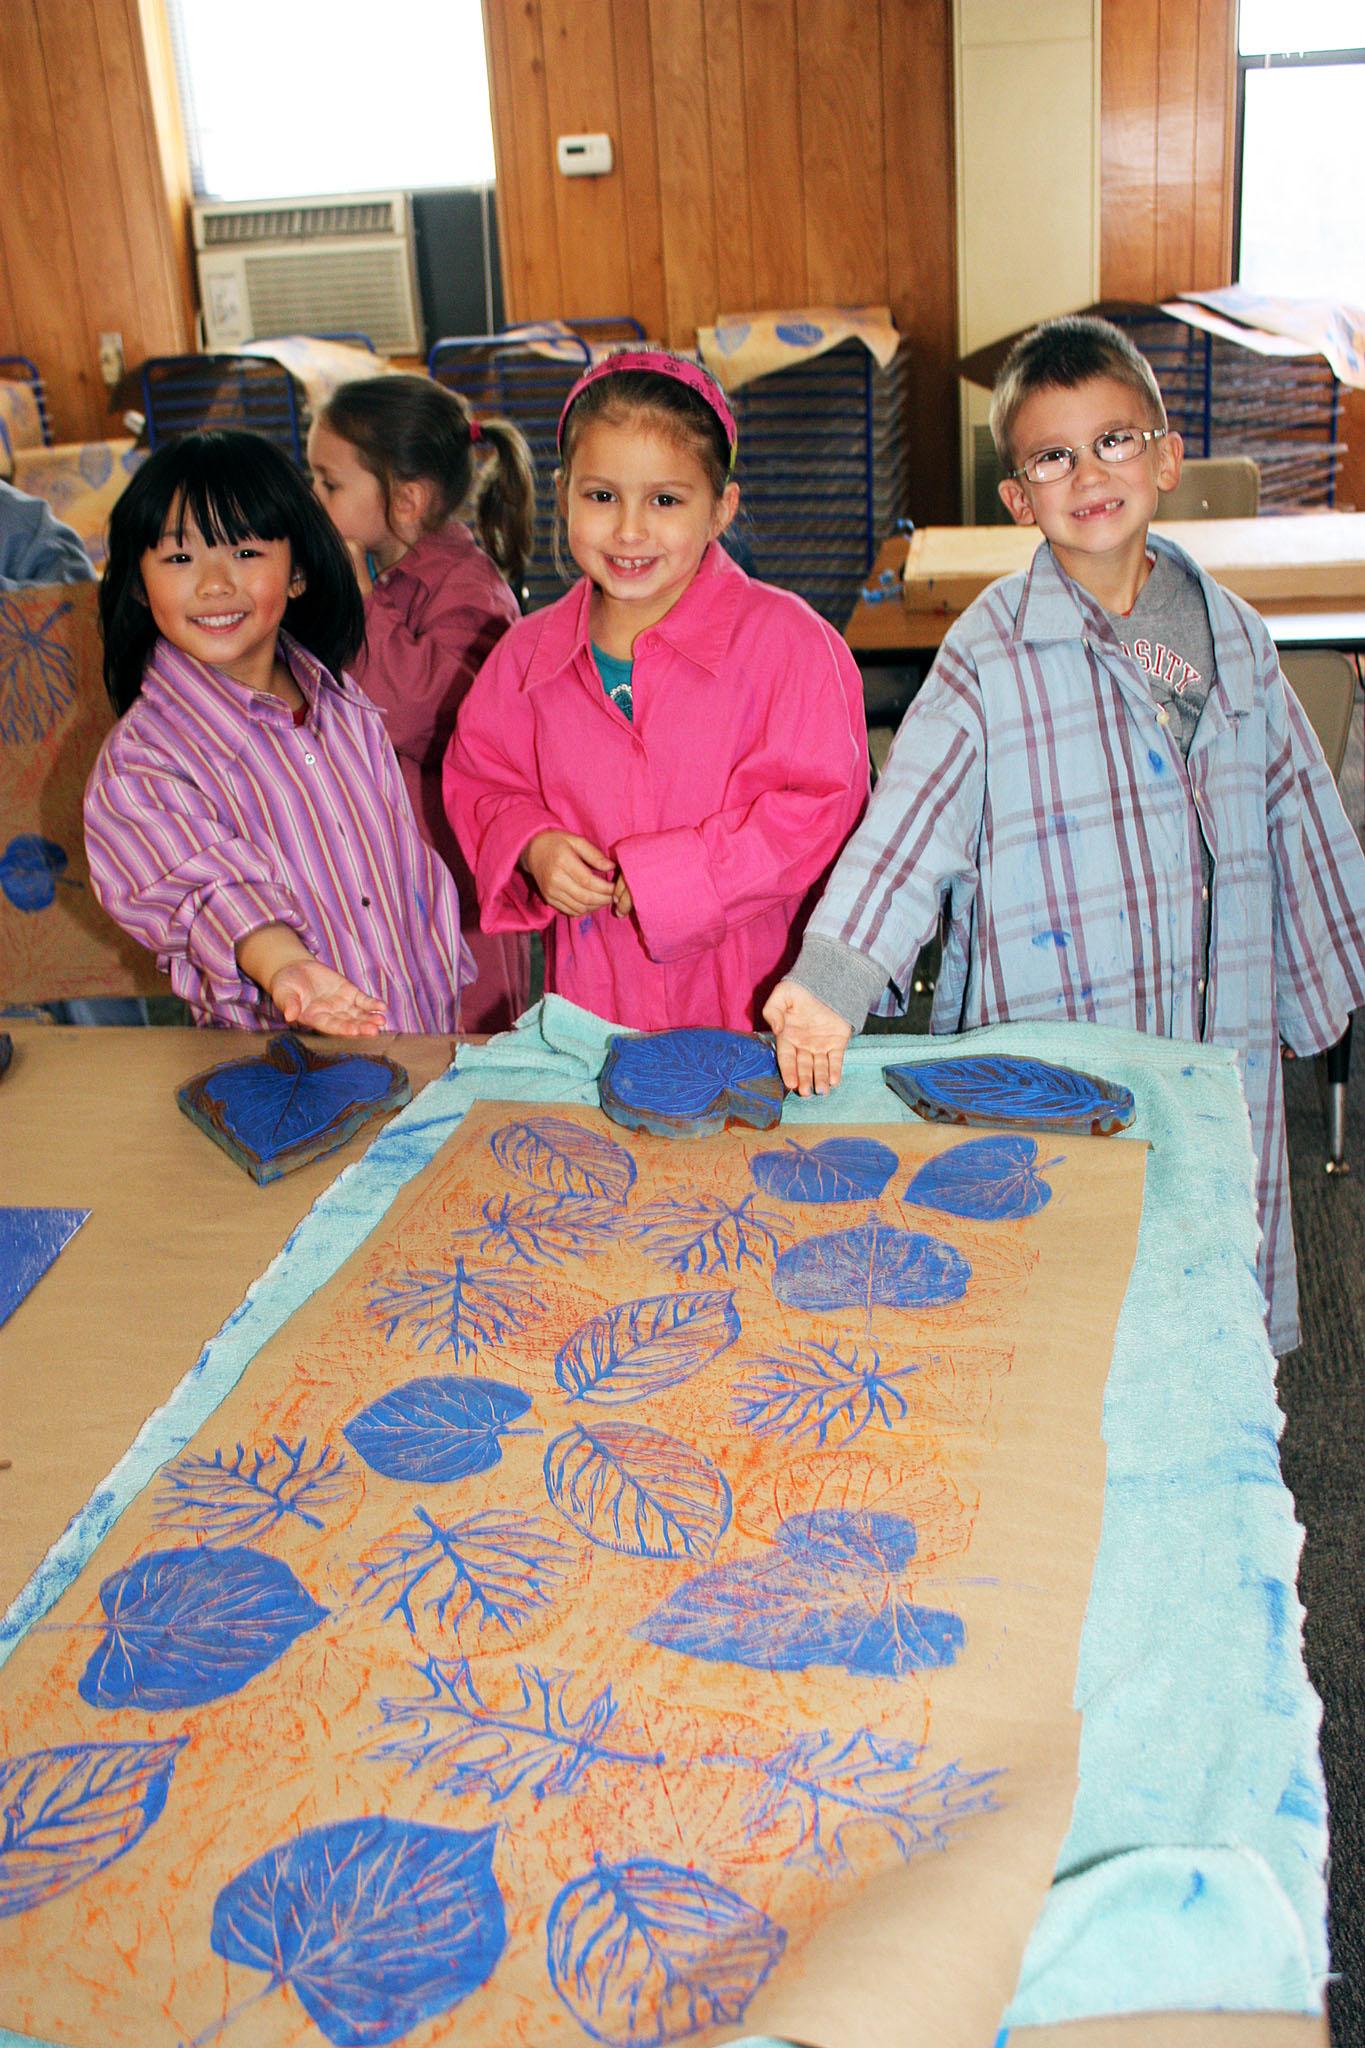 Students show off their handiwork at the Children's Summer Art Program.